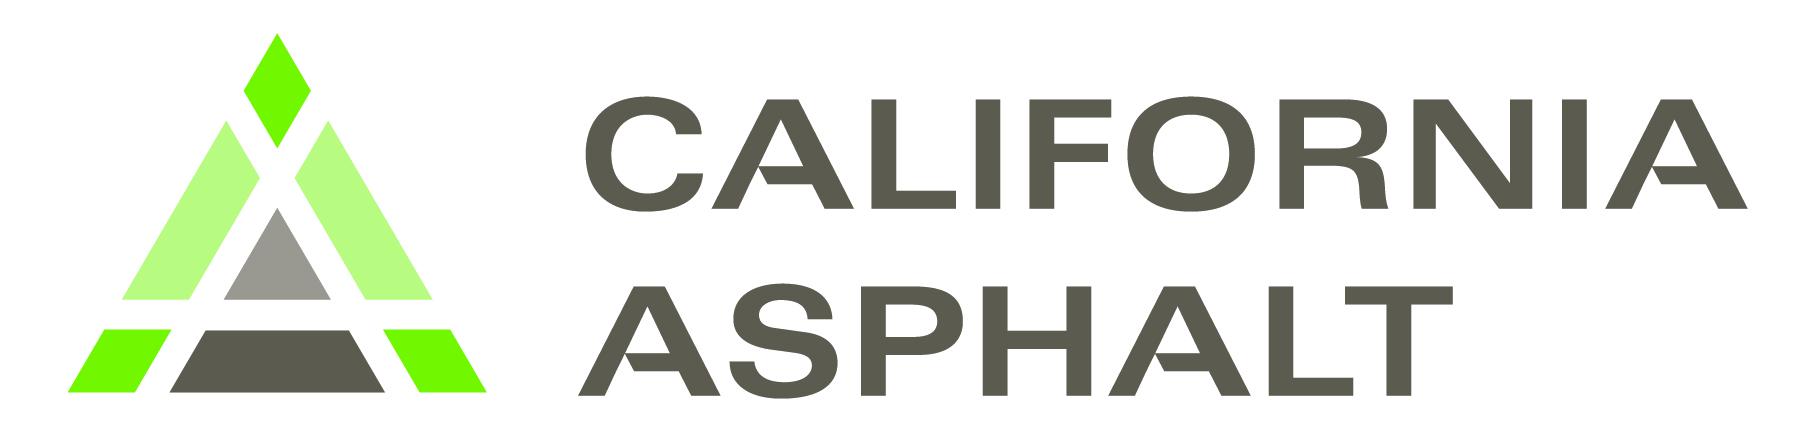 California Asphalt